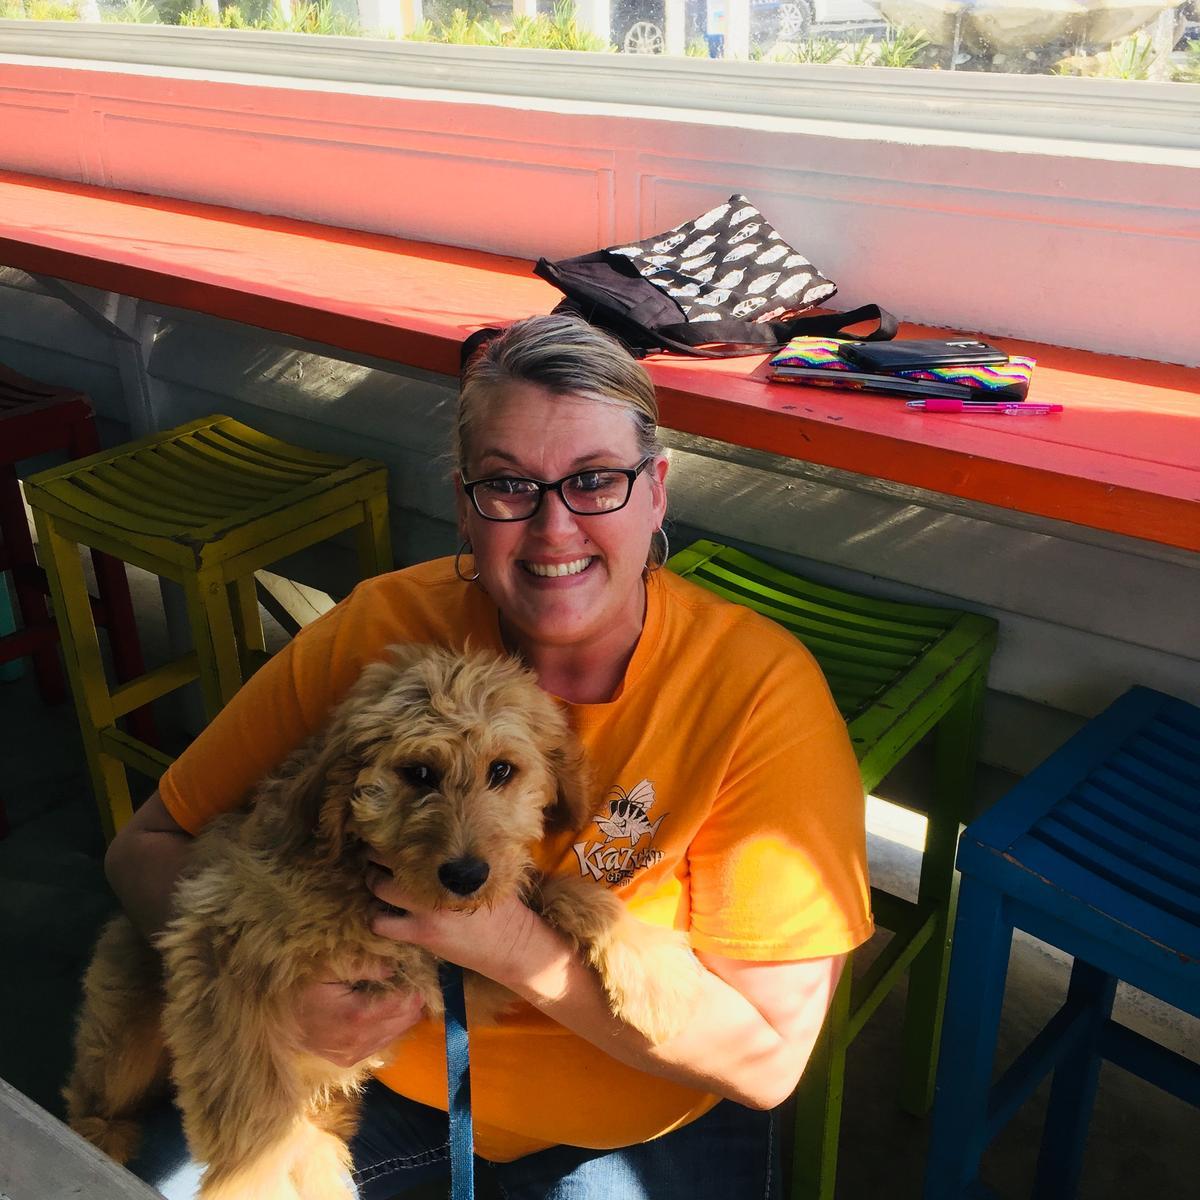 Buddy ❤️ Krazyfish and Shannon